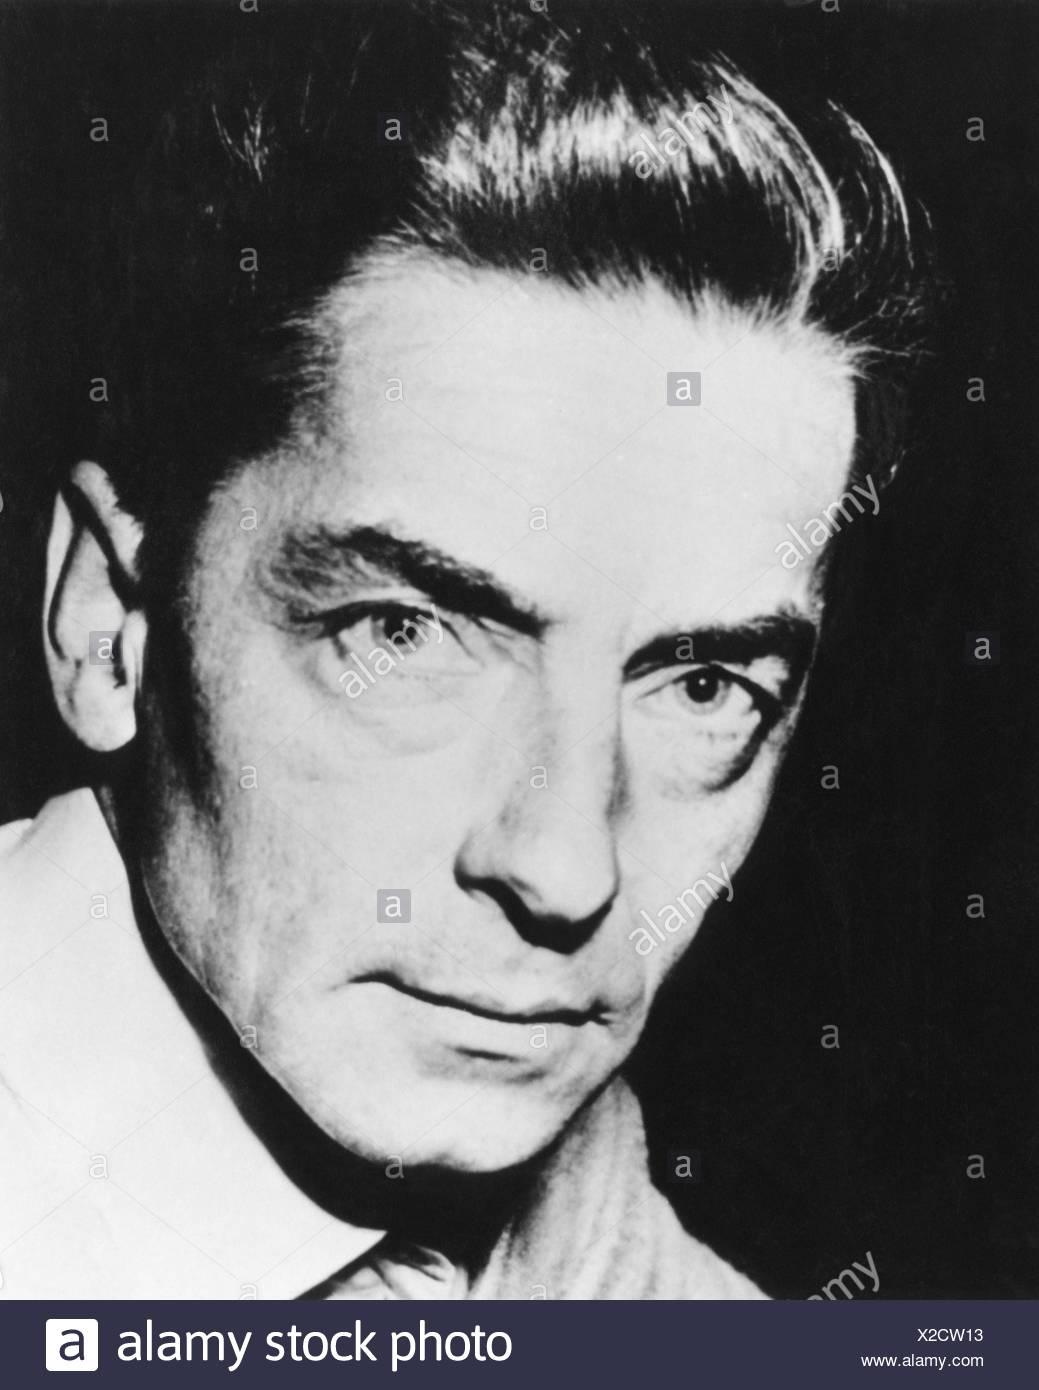 Karajan, Herbert von, 5.4.1908 - 16.7.1989, Austrian musician (conductor), portrait, , Stock Photo